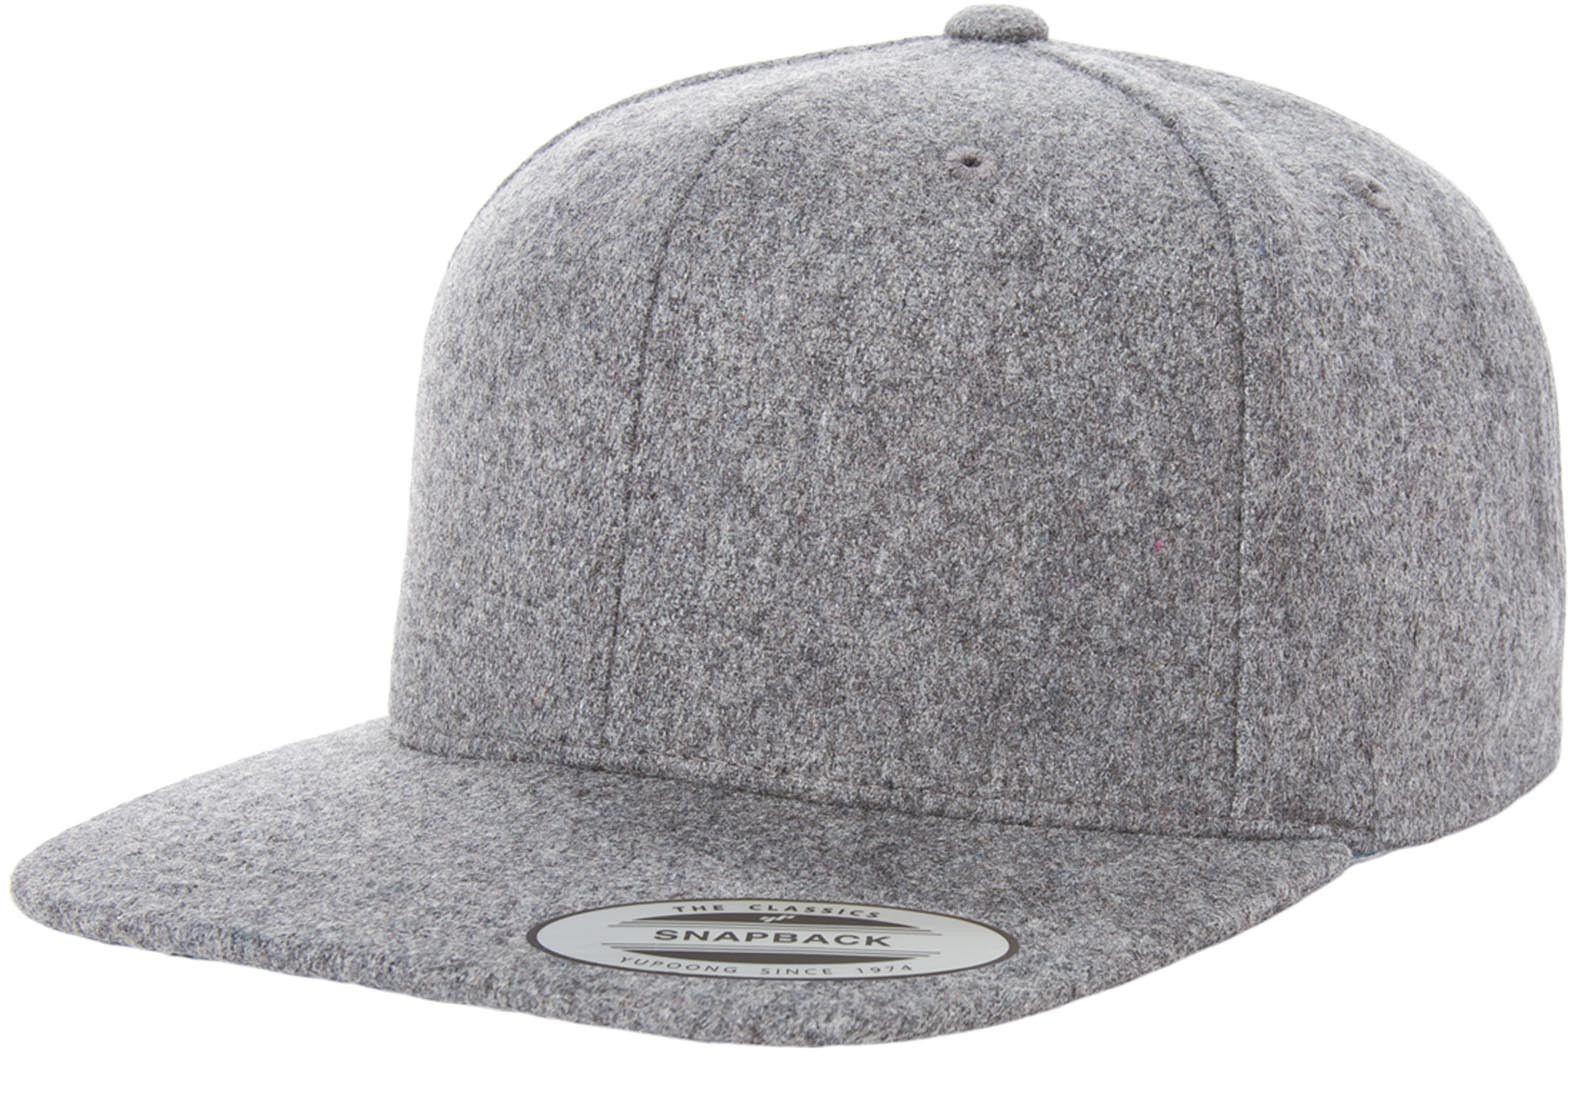 Flexfit Yupoong 6689M Melton Wool Snapback Hat Wholesale  Heather Grey  6ae9aced20a2